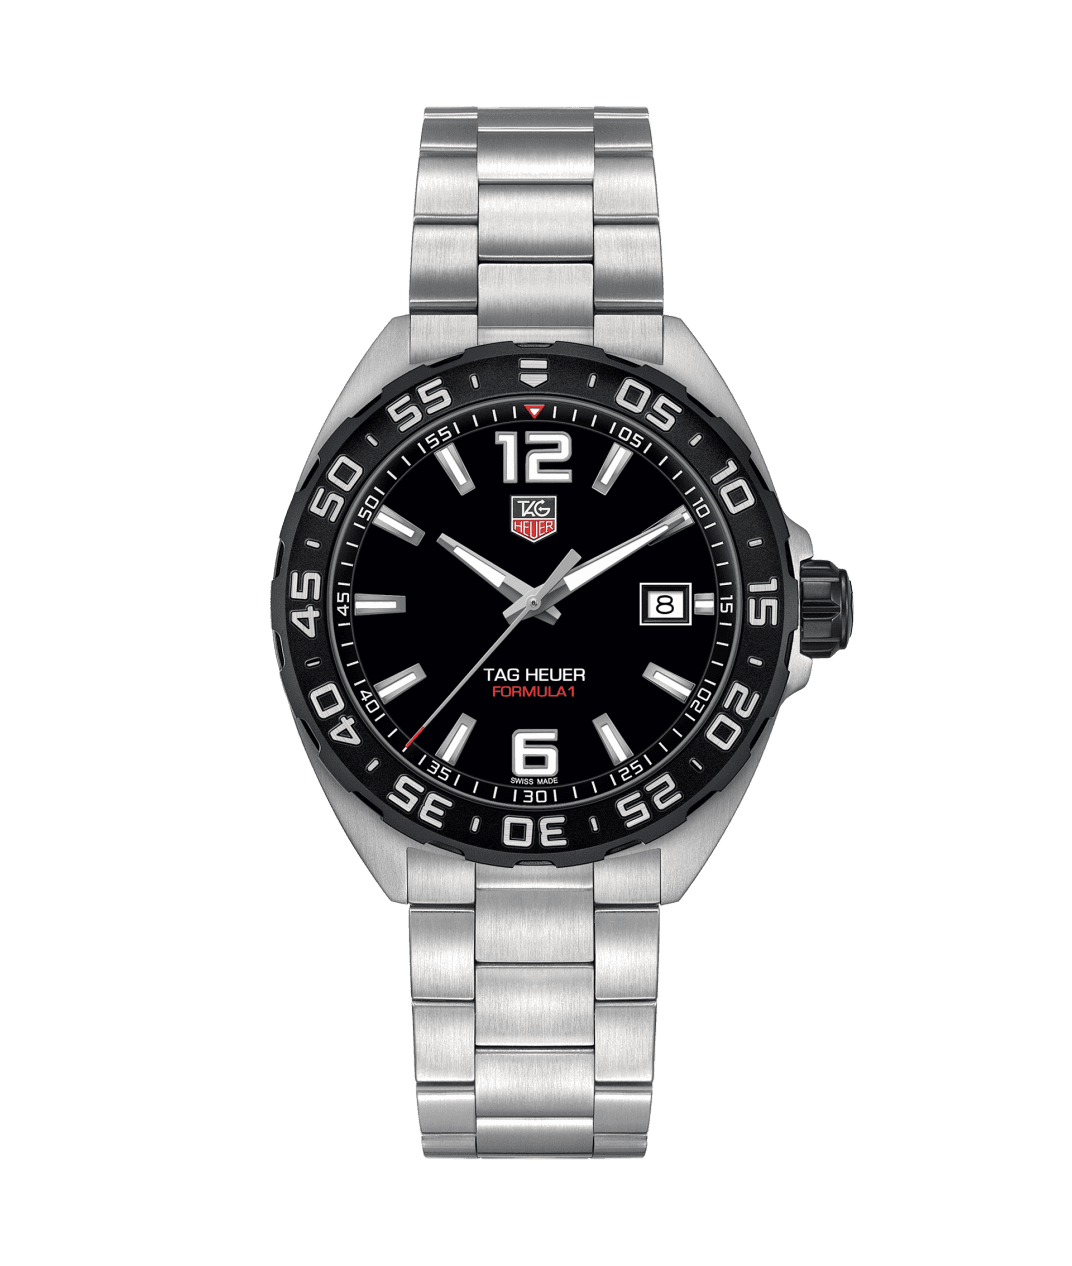 Tag-Heuer-Montre-Formula-1-Quartz-Hall-of-Time-WAZ1110-BA0875